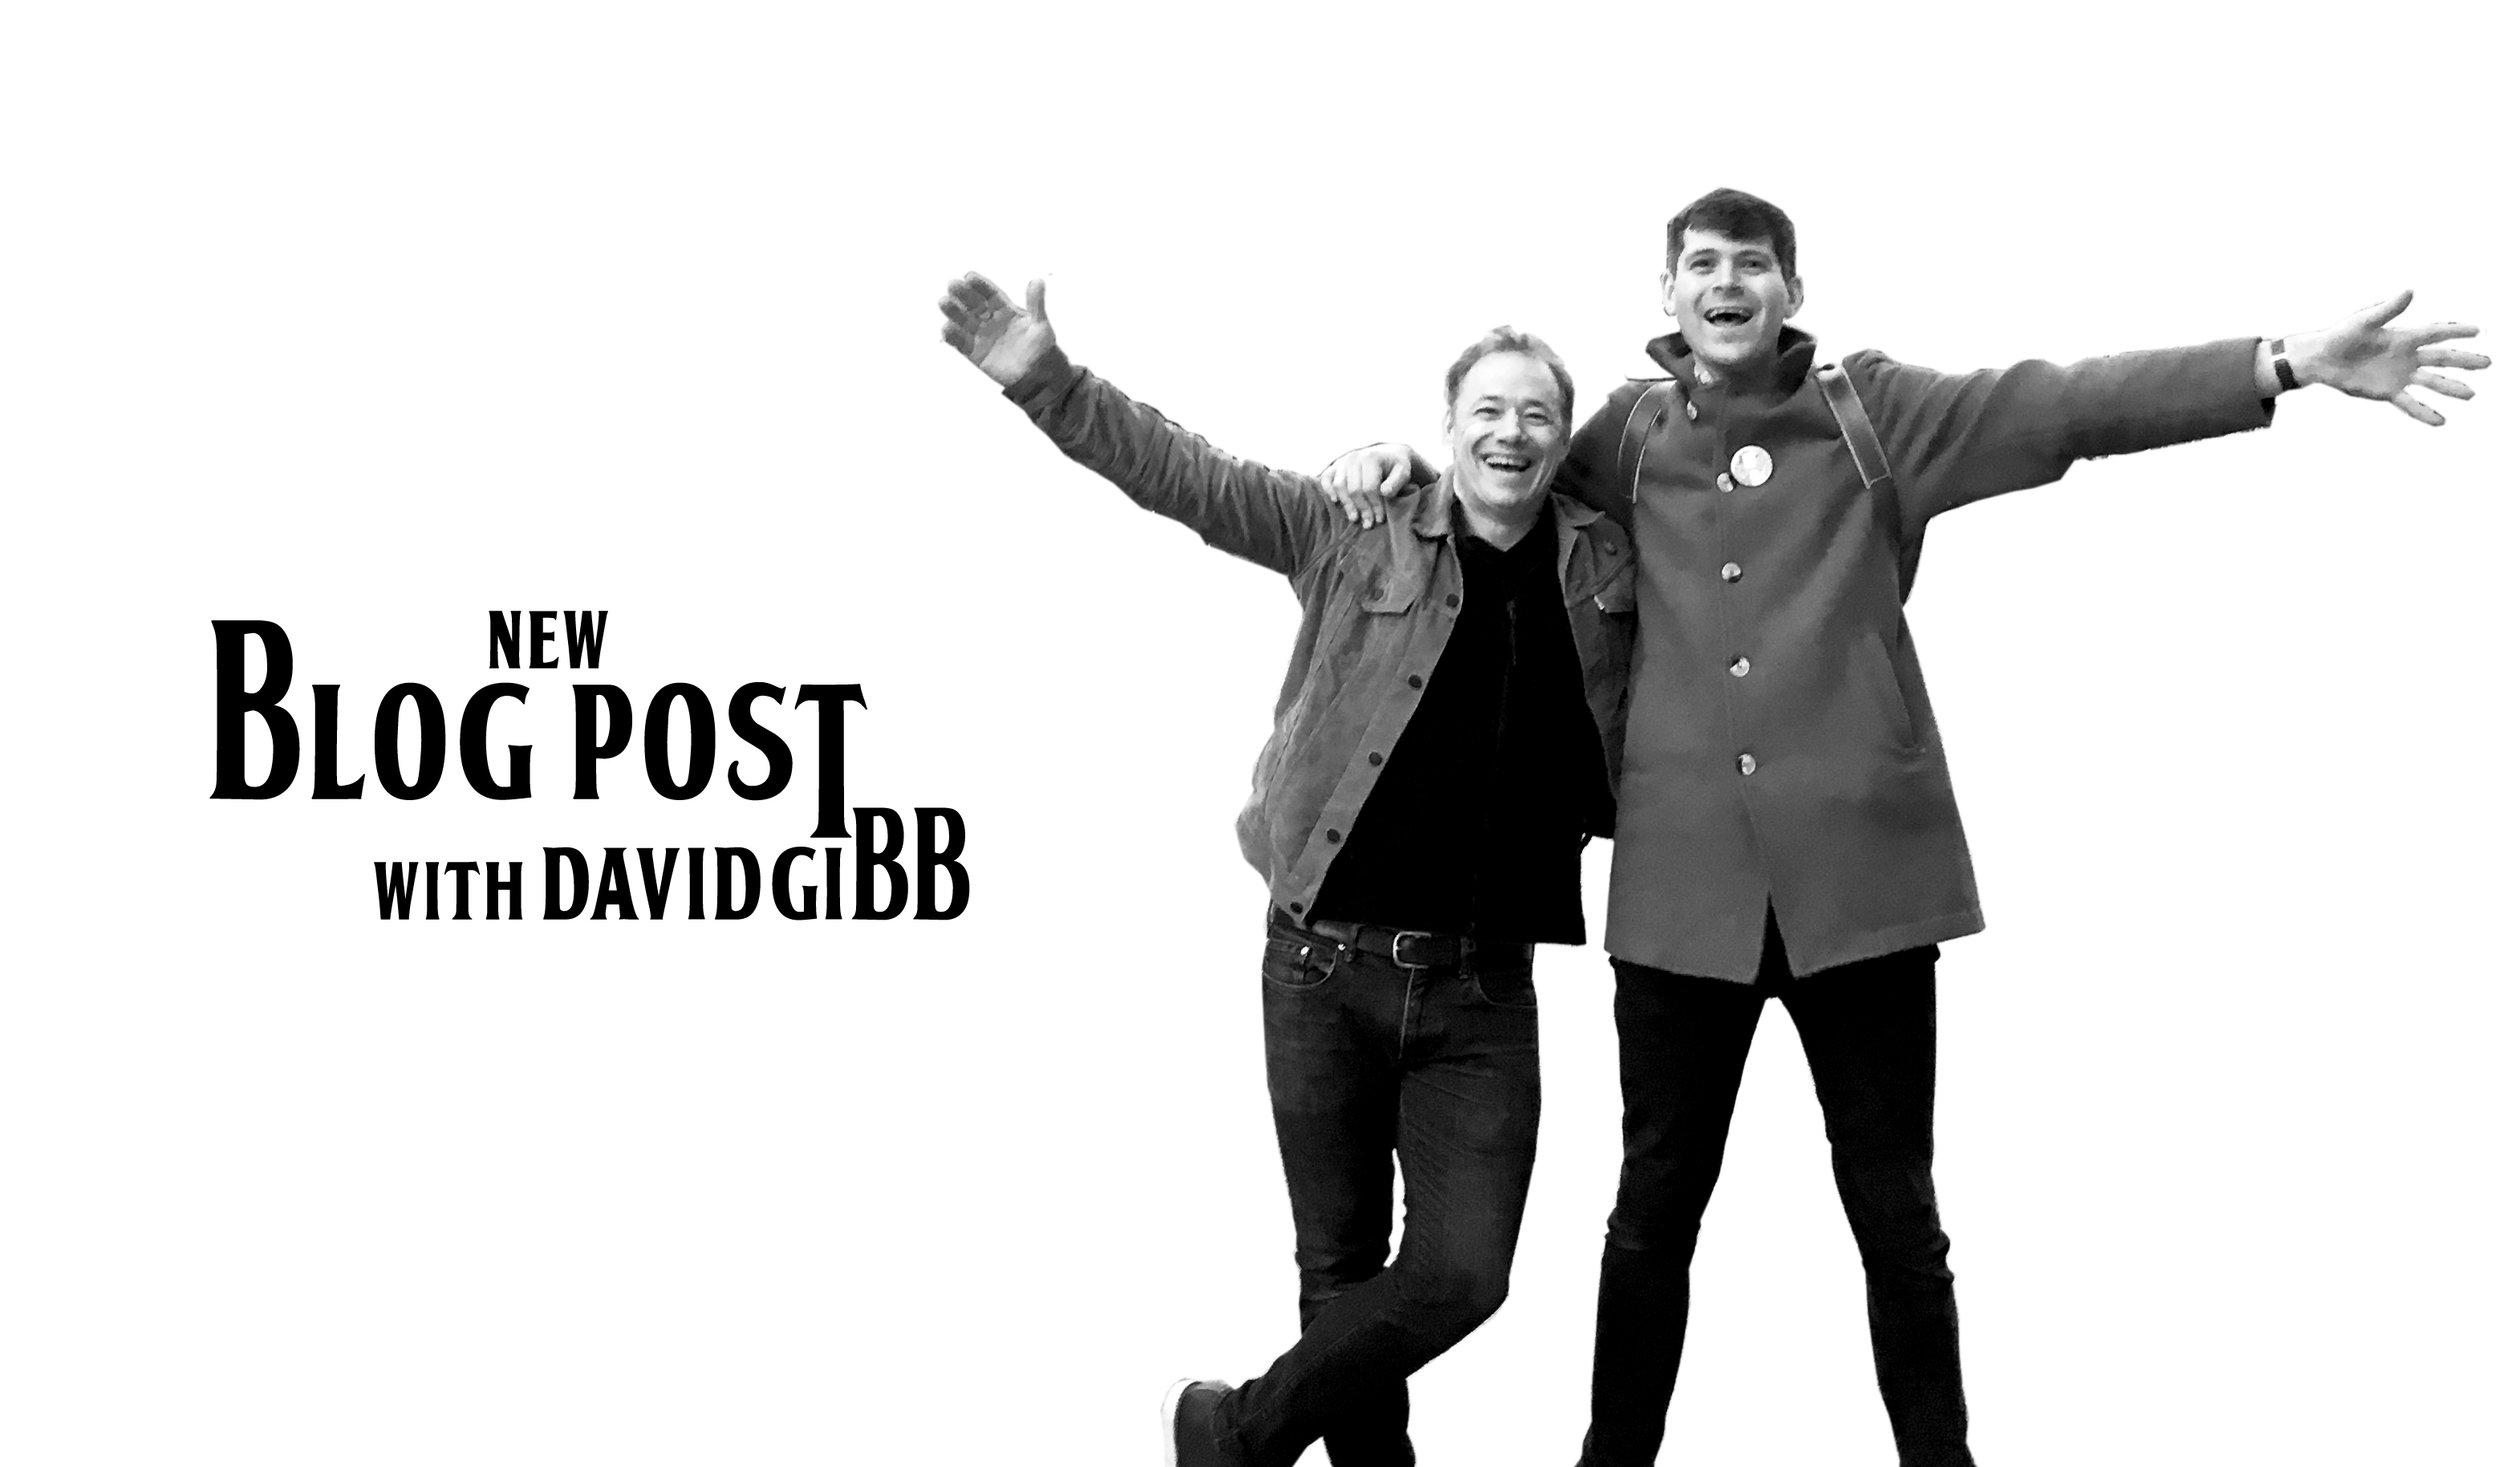 david blog post2.jpg